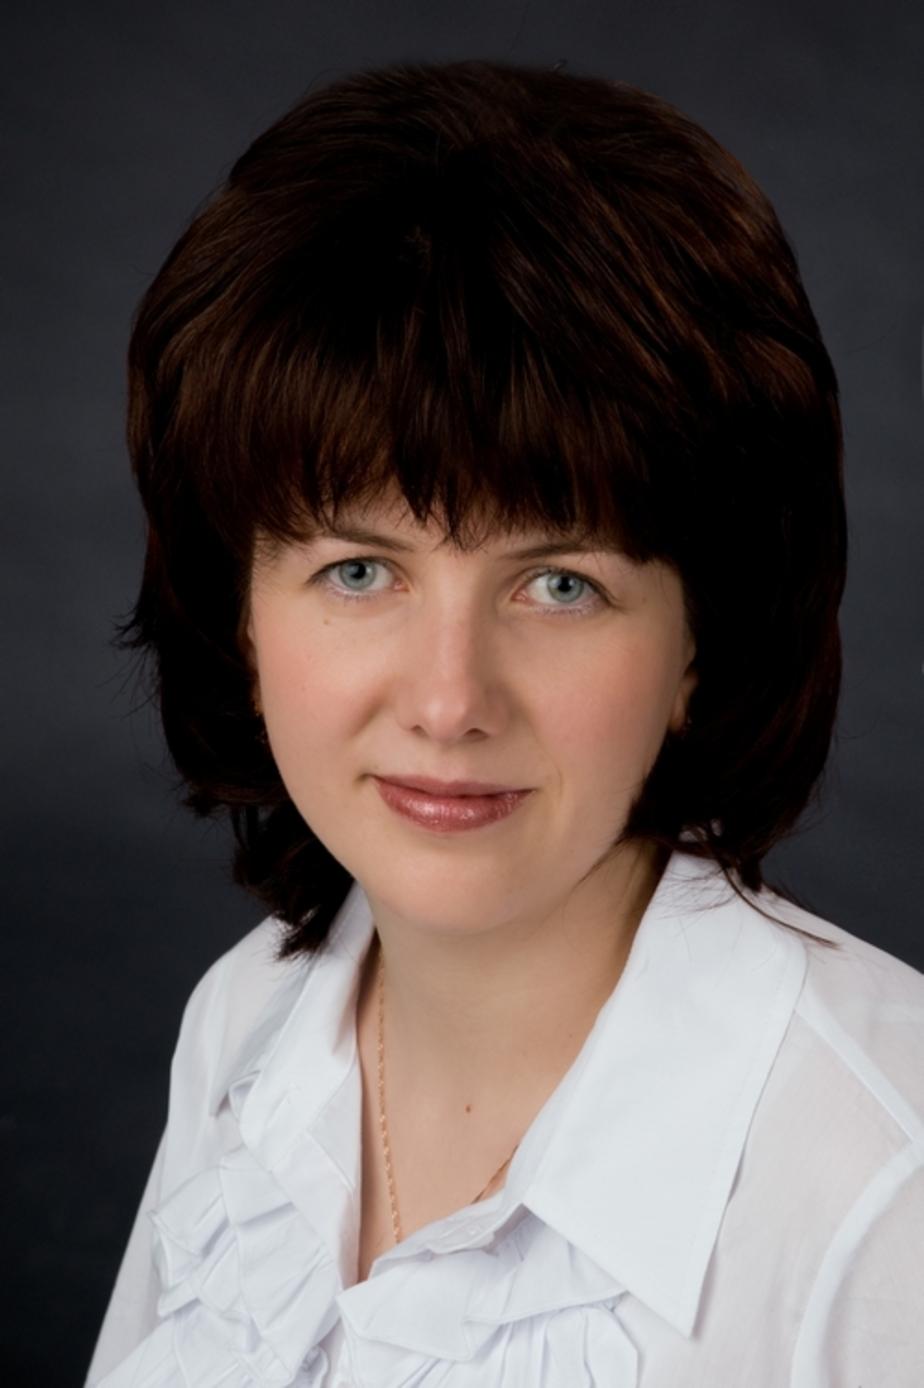 Директор юридического бюро Вероника Королёва: Если муж не платит алименты - Новости Калининграда